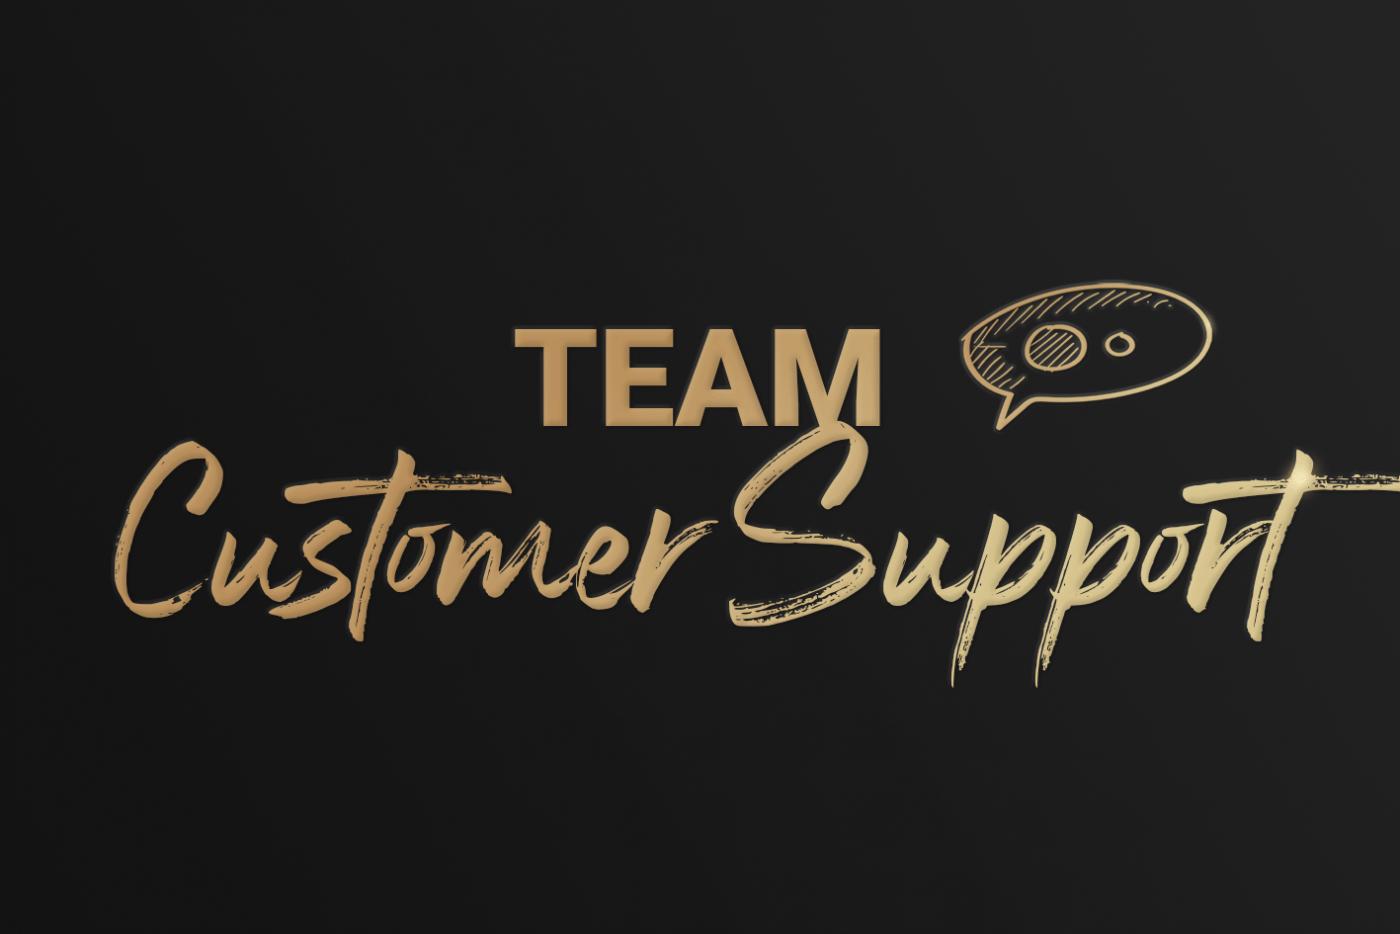 Kachel karriere team CustomerSupport 1400x934 - Karriere